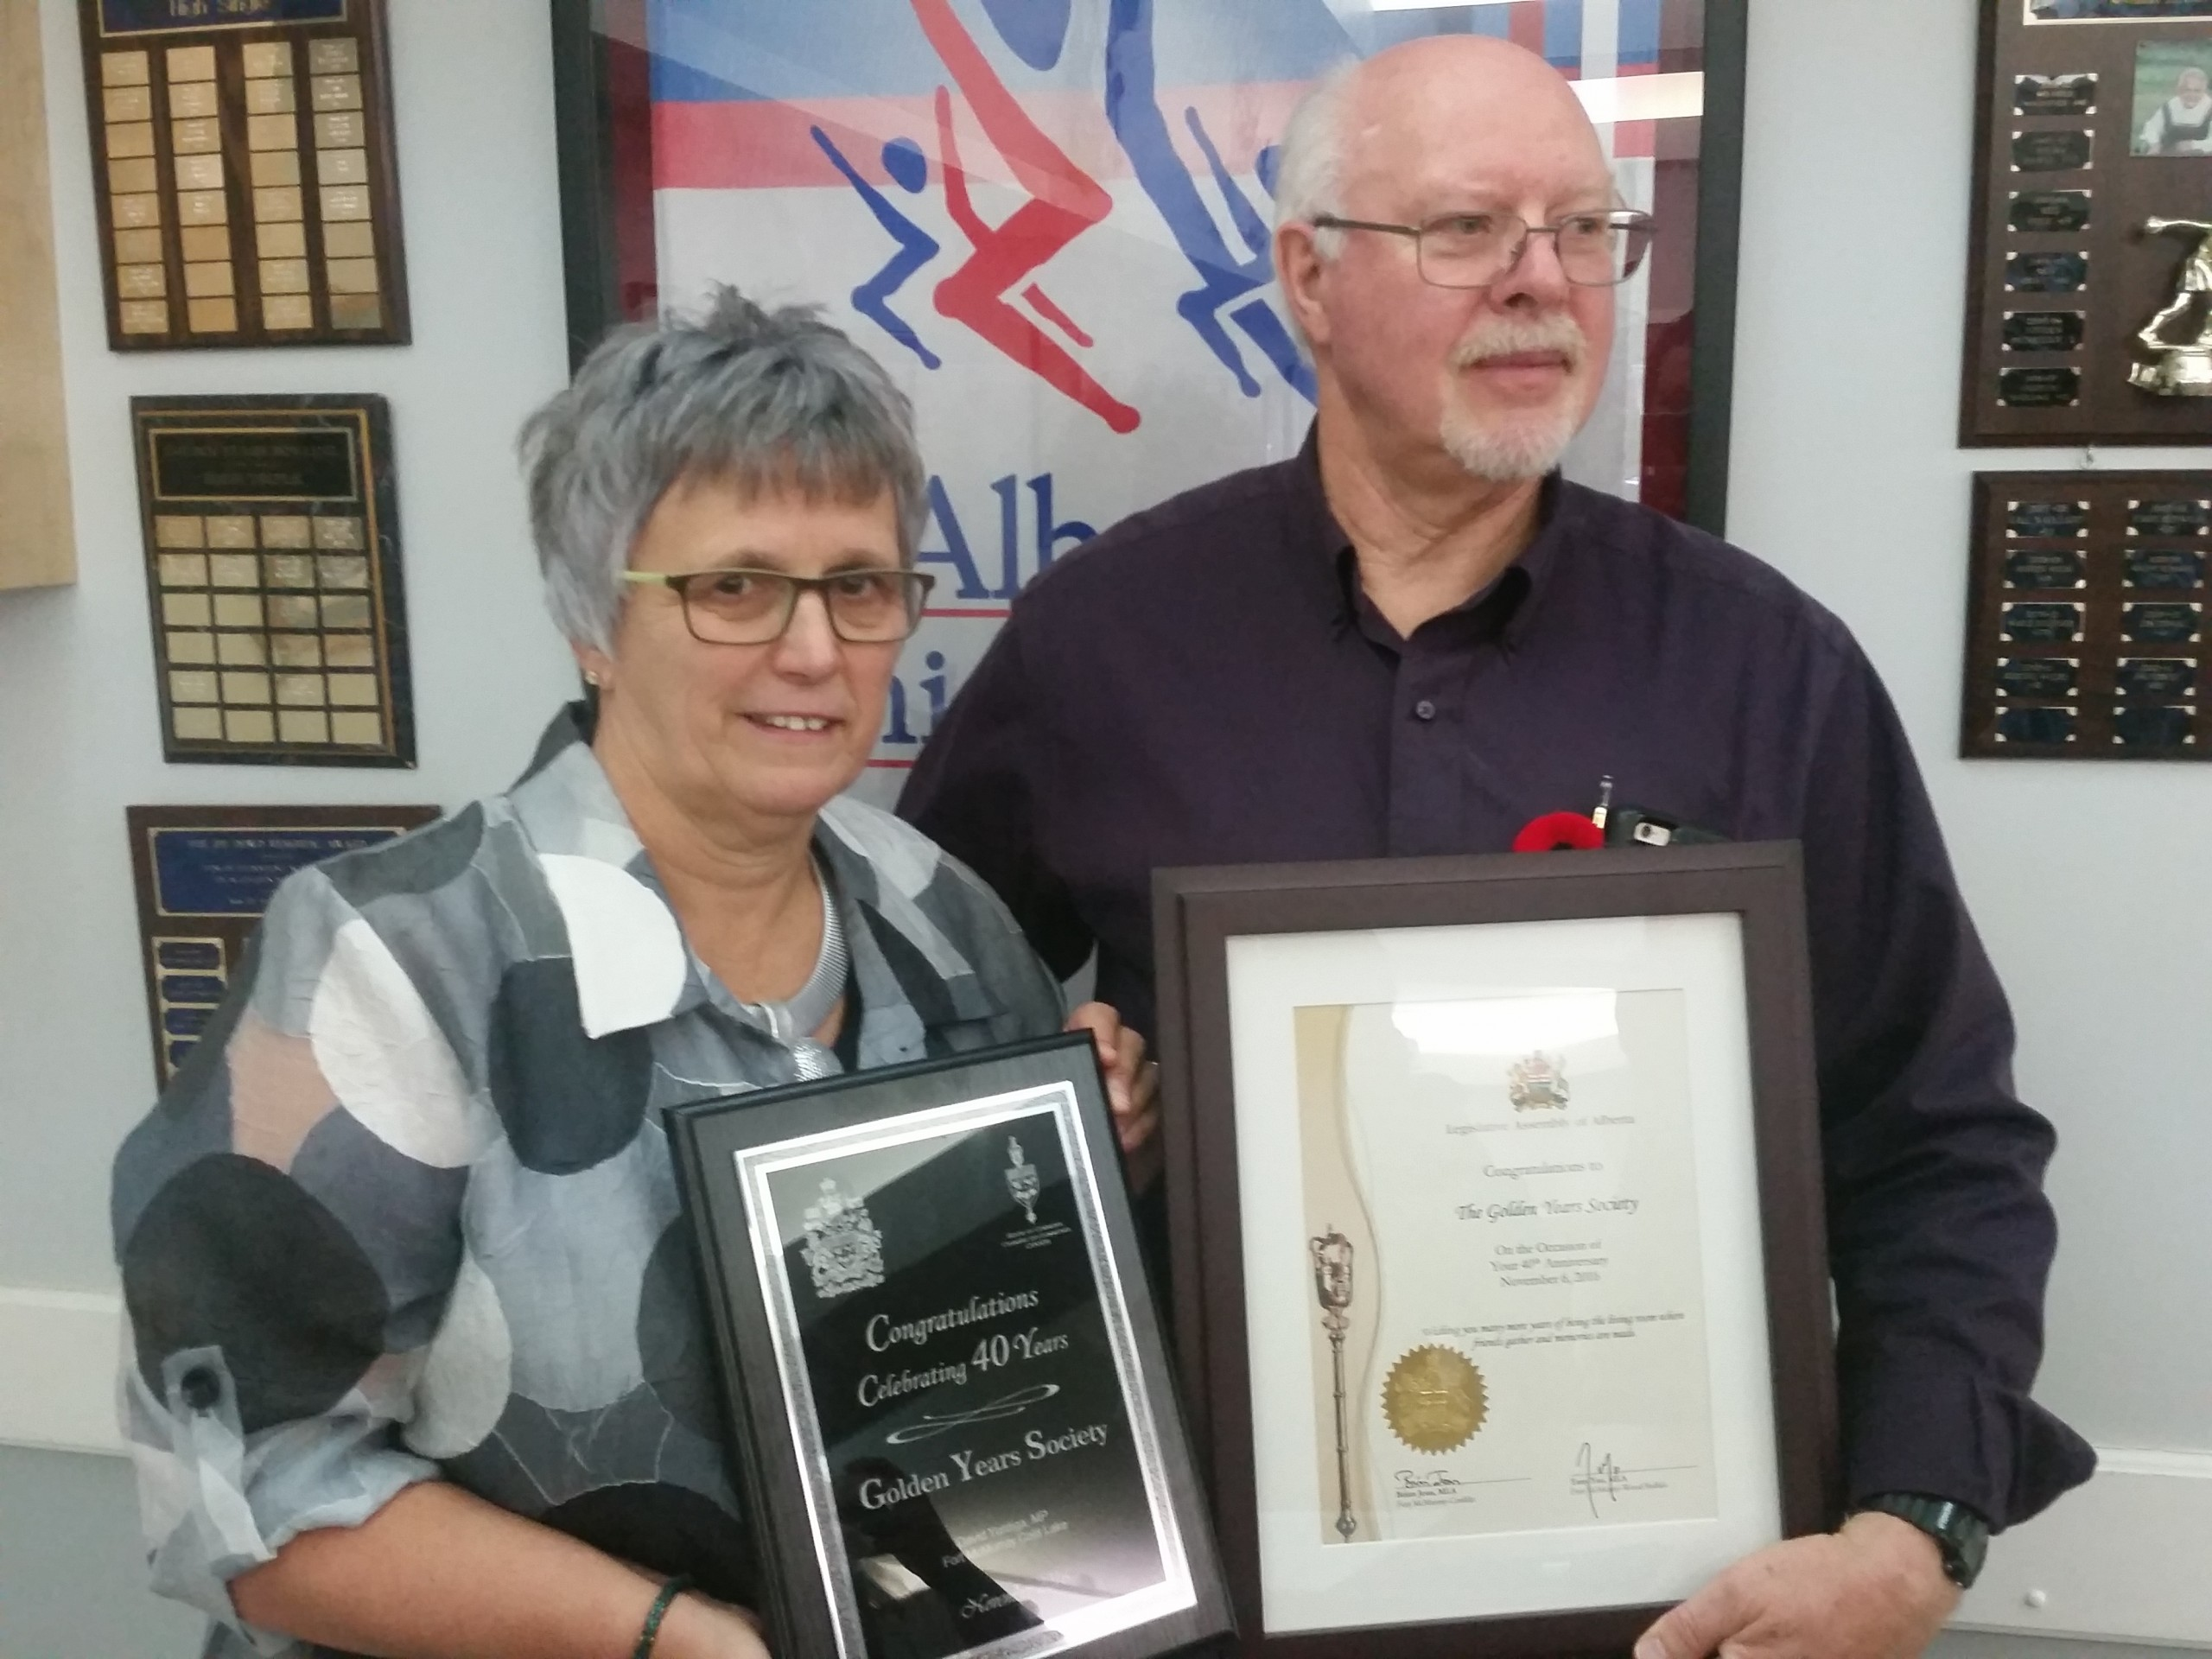 Golden Years Society celebrates 40 years